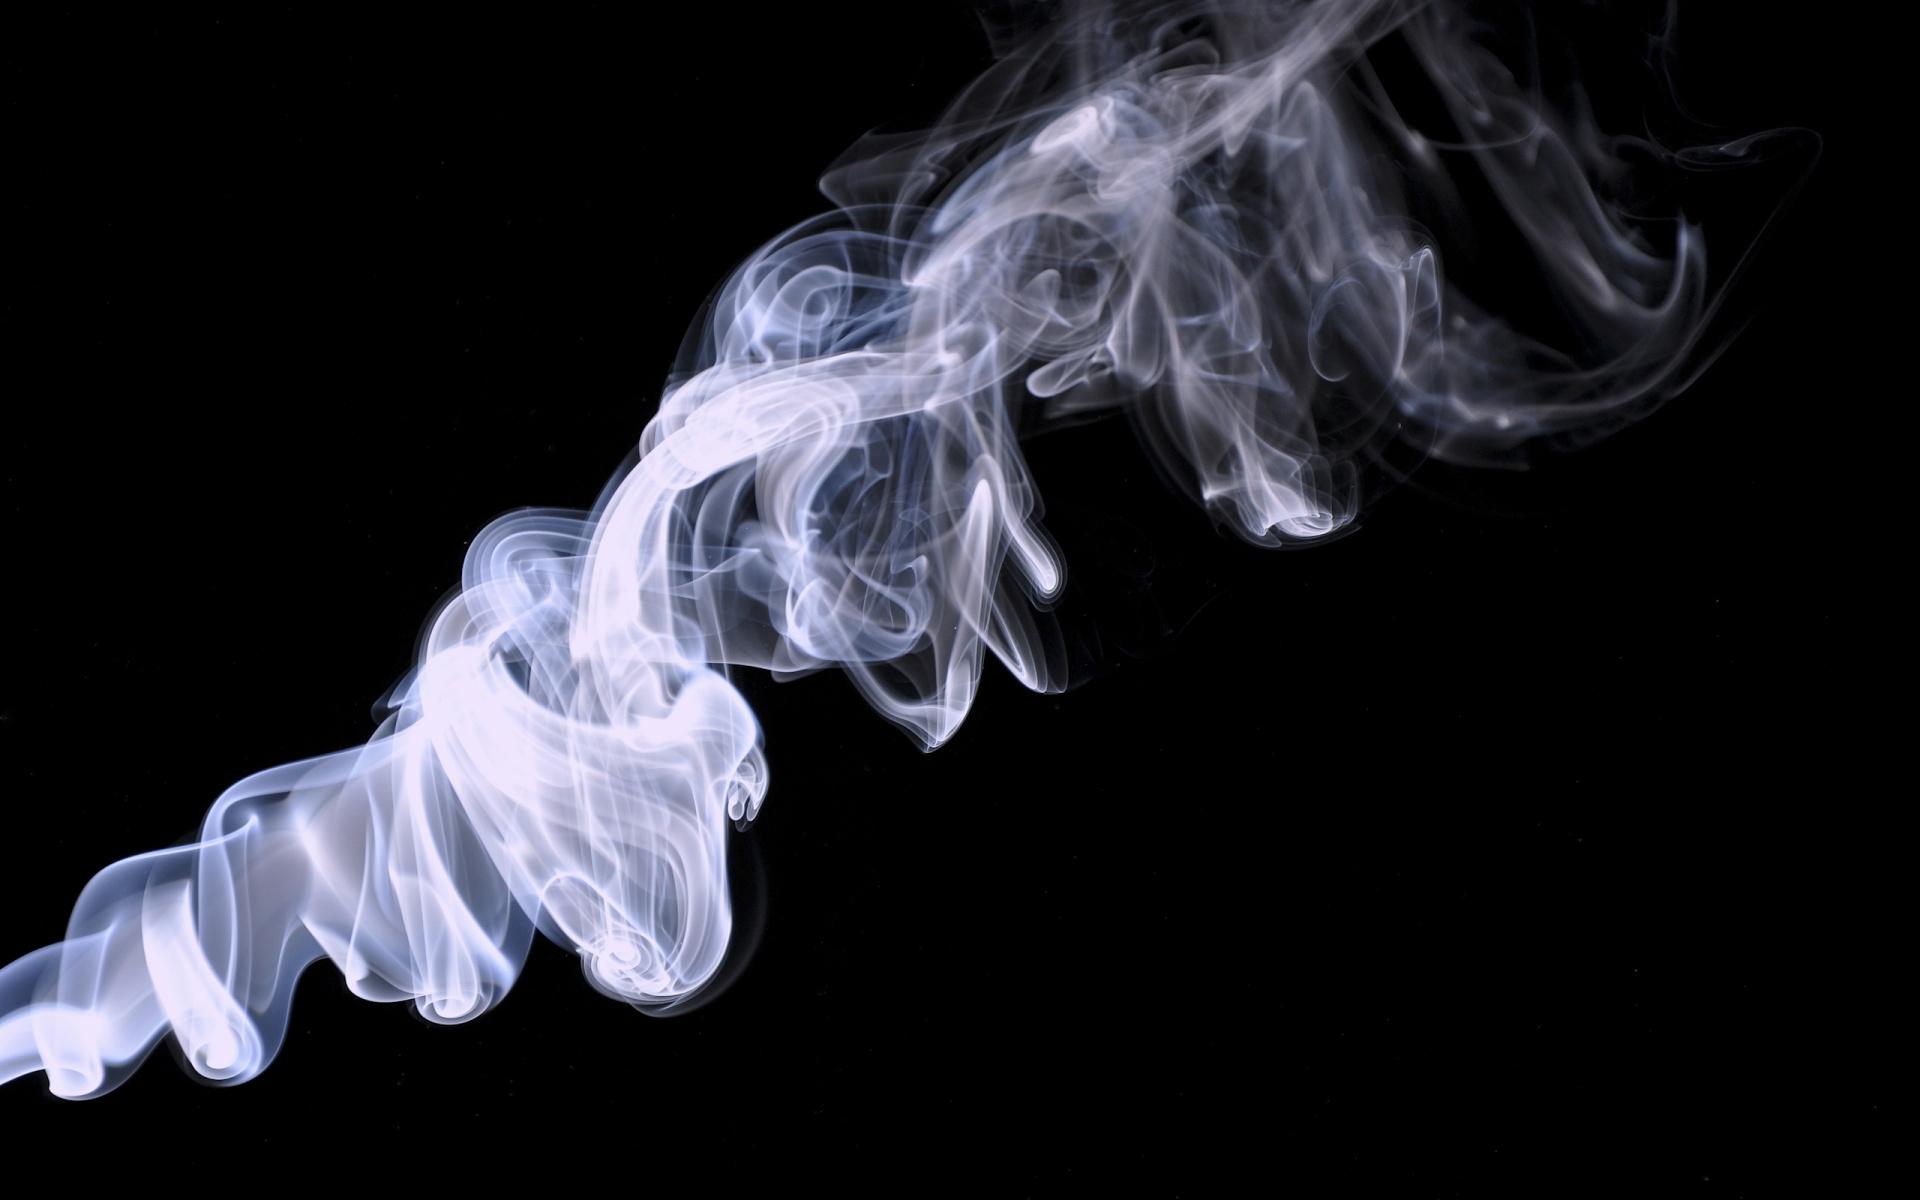 X-Ray-Smoke-1920x1200-hd-wallpapers.co.jpg